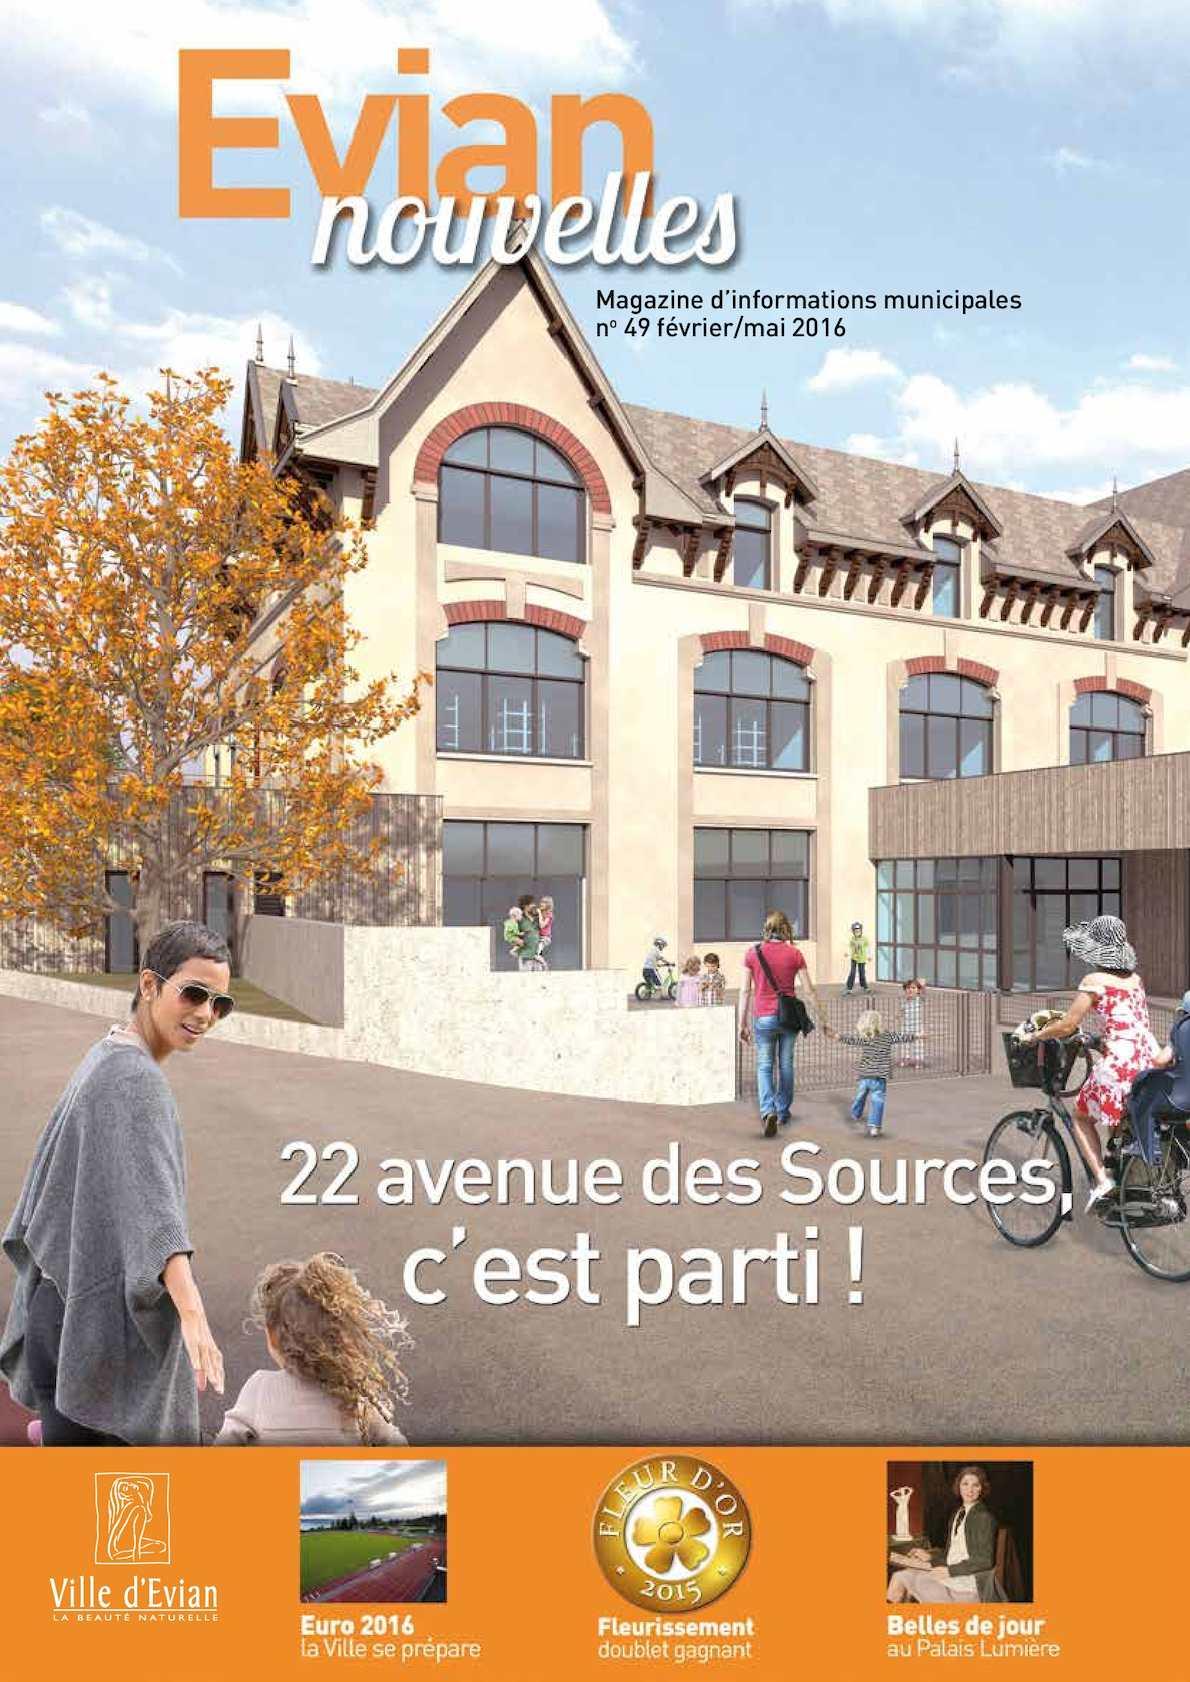 Calam o journal municipal evian nouvelles 49 for Piscine d evian